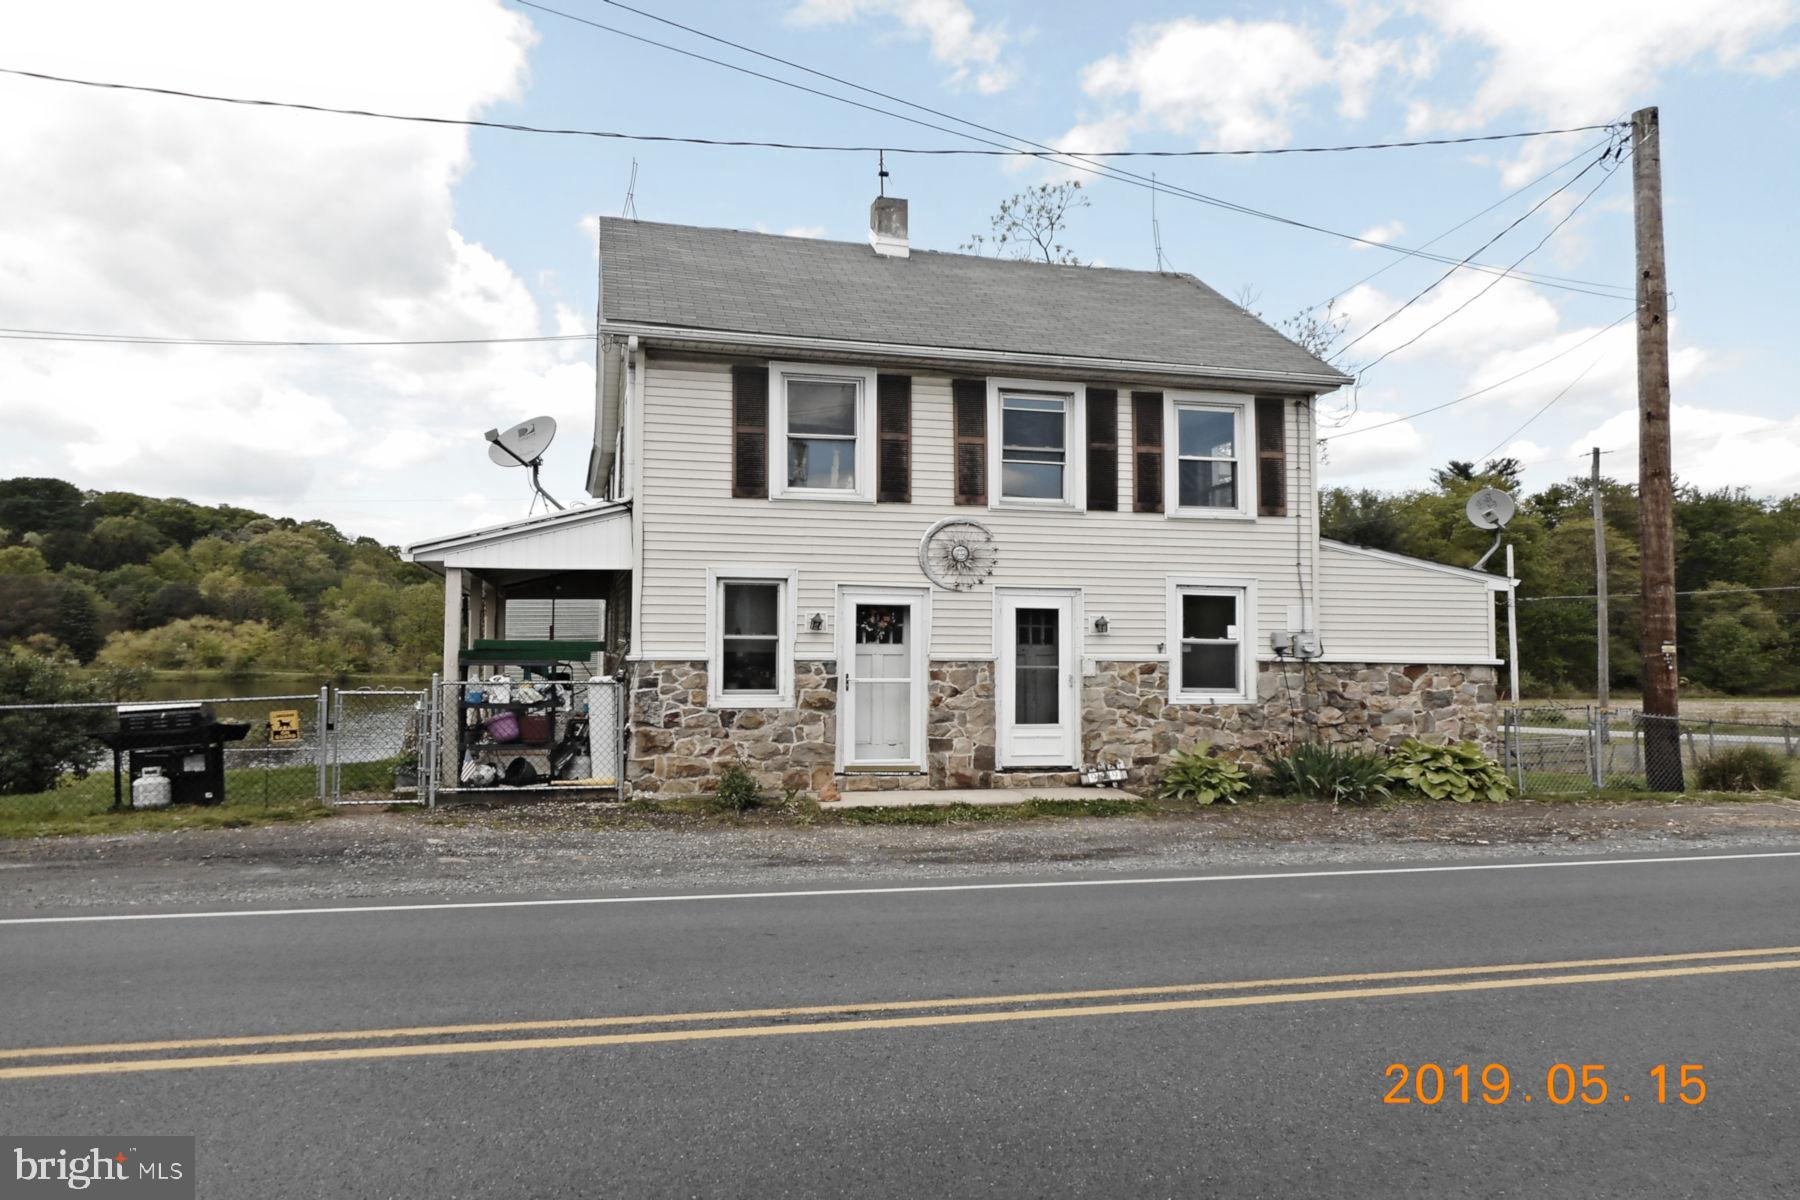 977-979 DETURKSVILLE ROAD, PINE GROVE, PA 17963